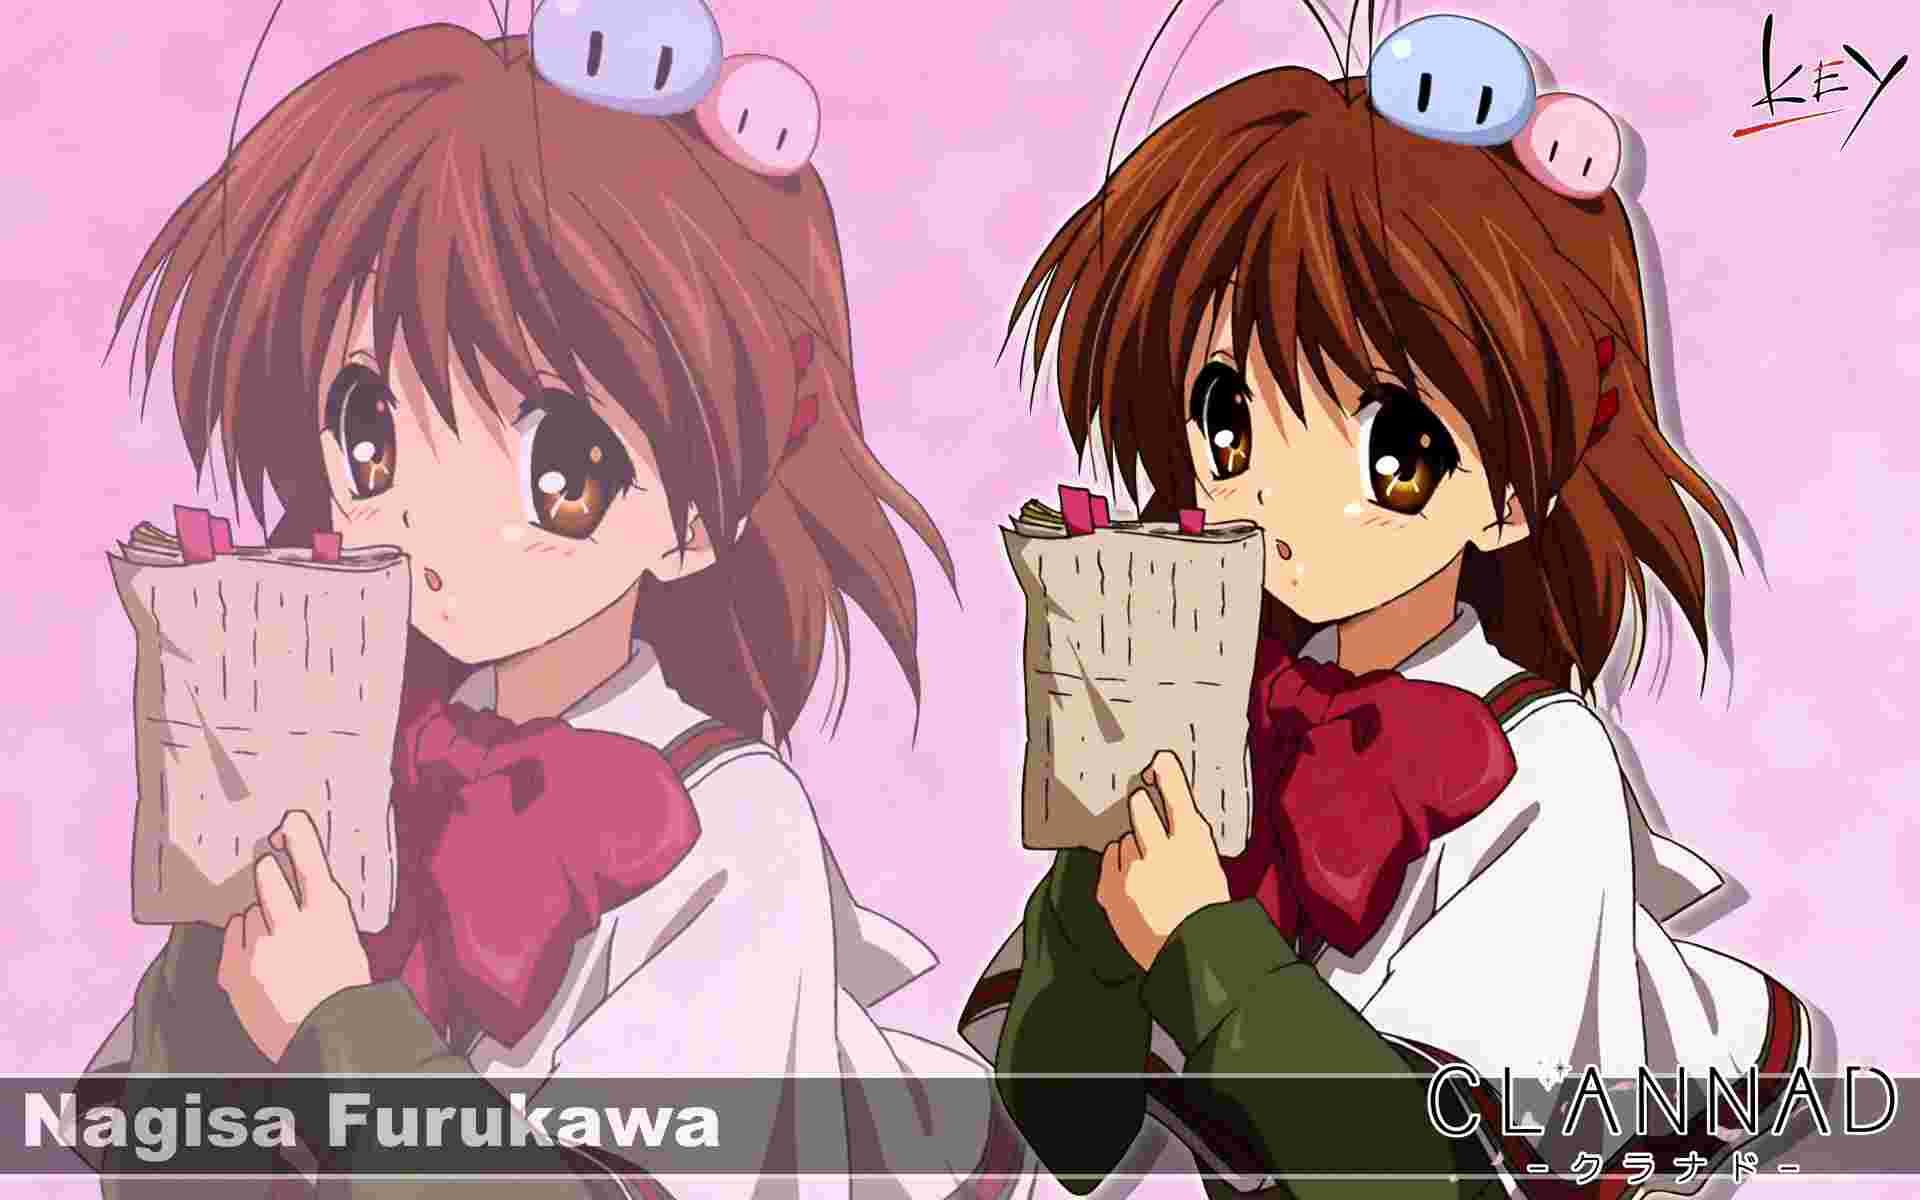 clannad furukawa nagisa 227 wallpaper   Clannad   Anime Manga   Hot 1920x1200